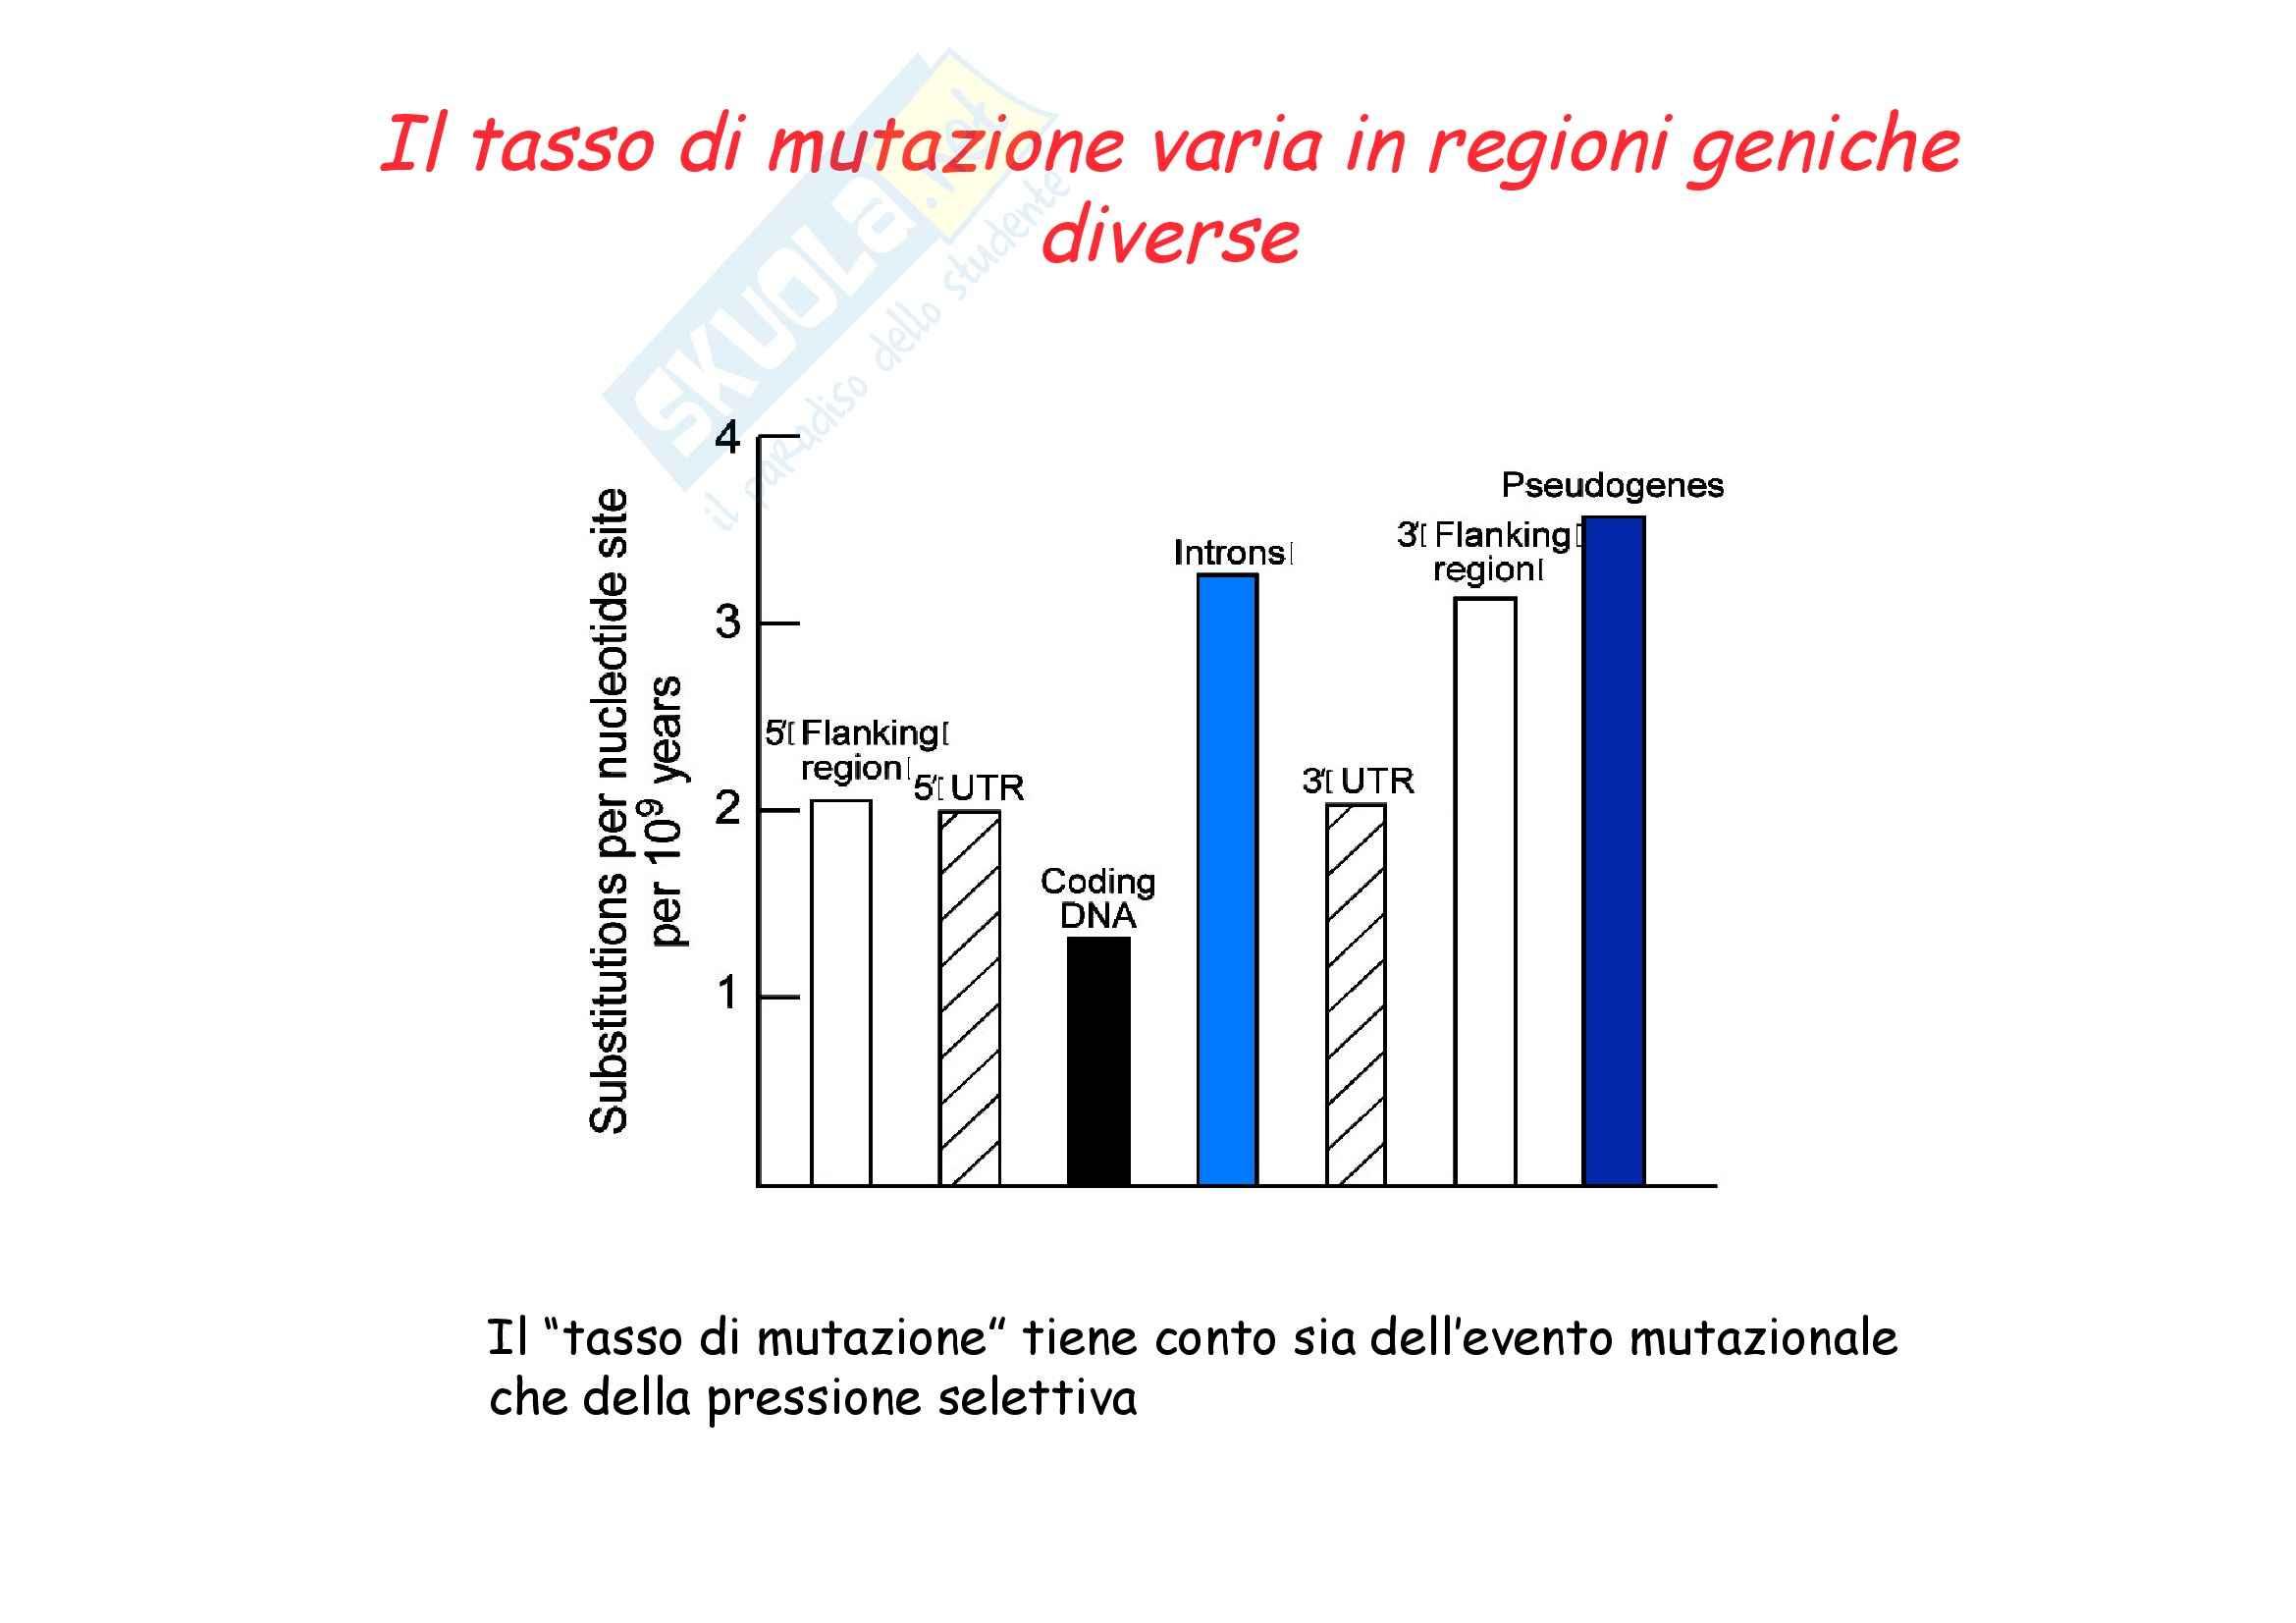 Genetica umana - alleli e Mendel - Appunti Pag. 11